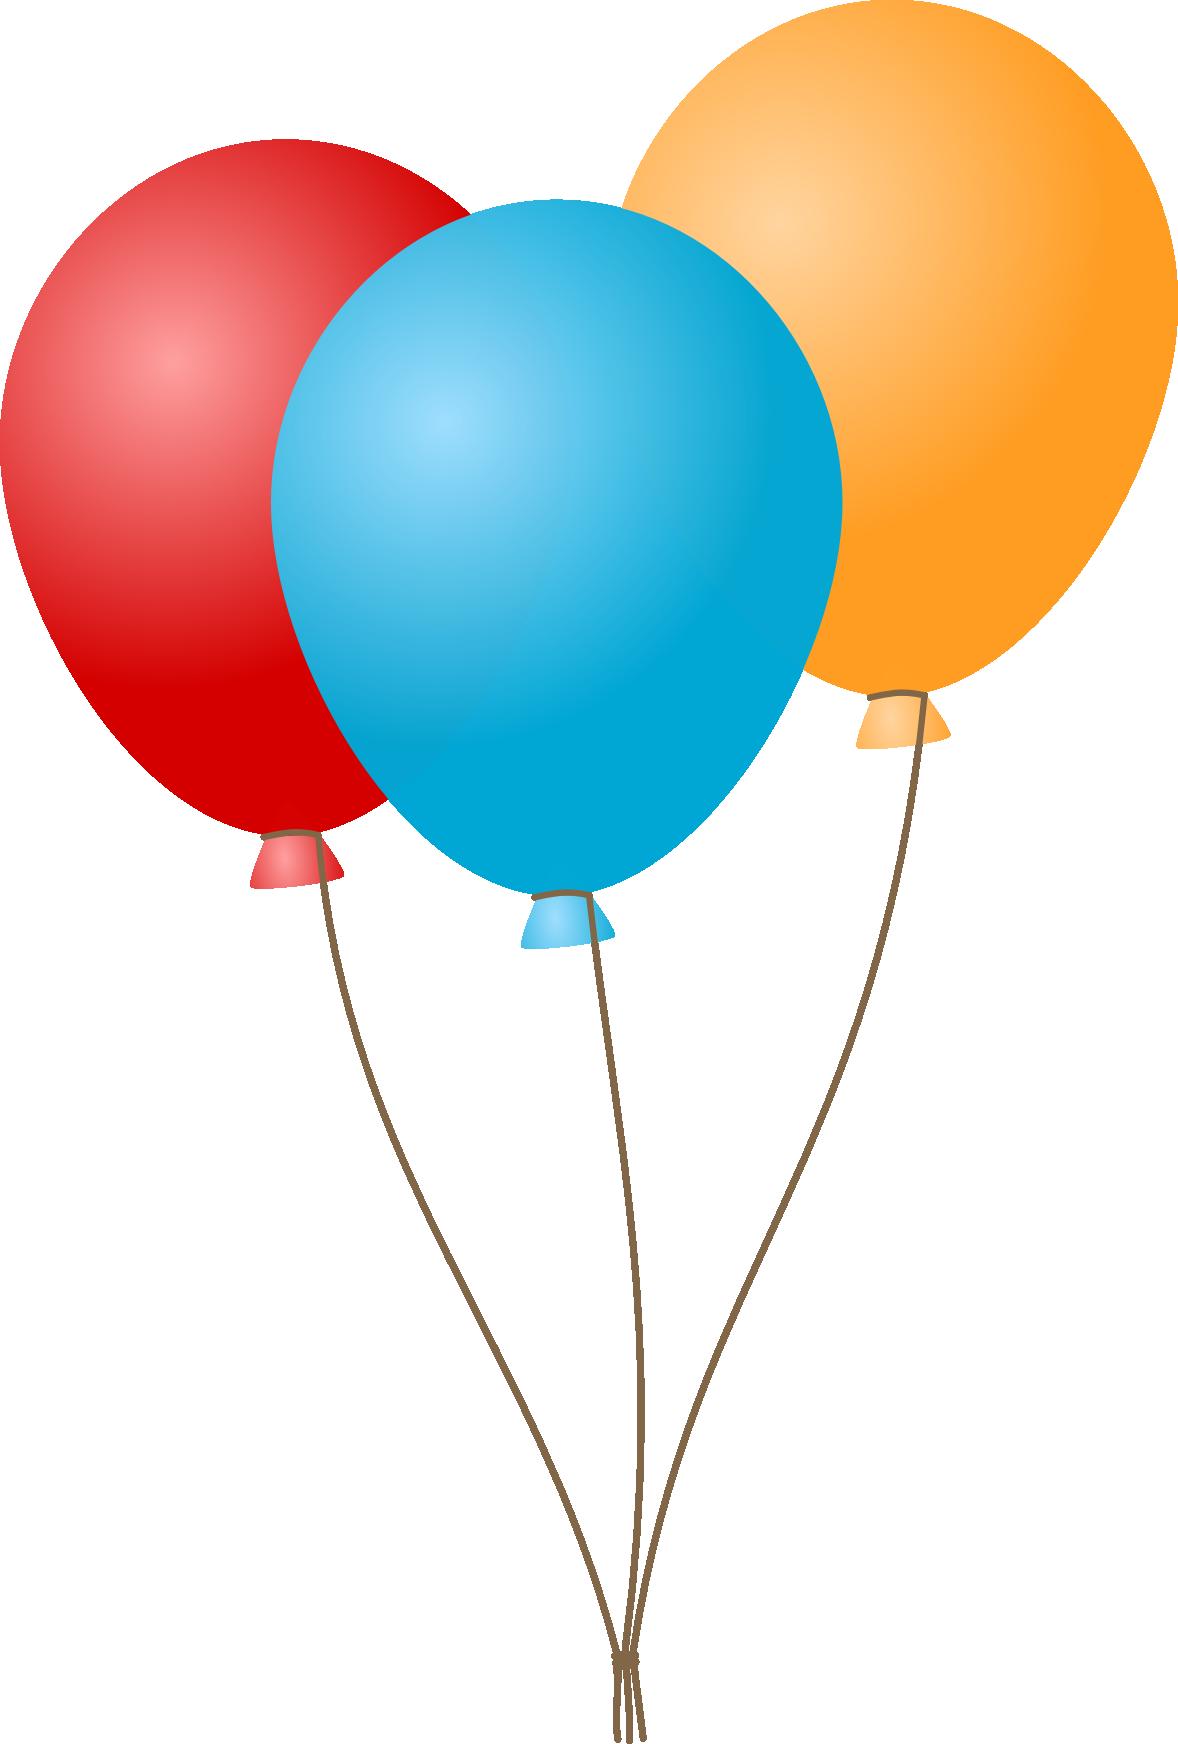 balloon PNG image - Balloon  PNG HD